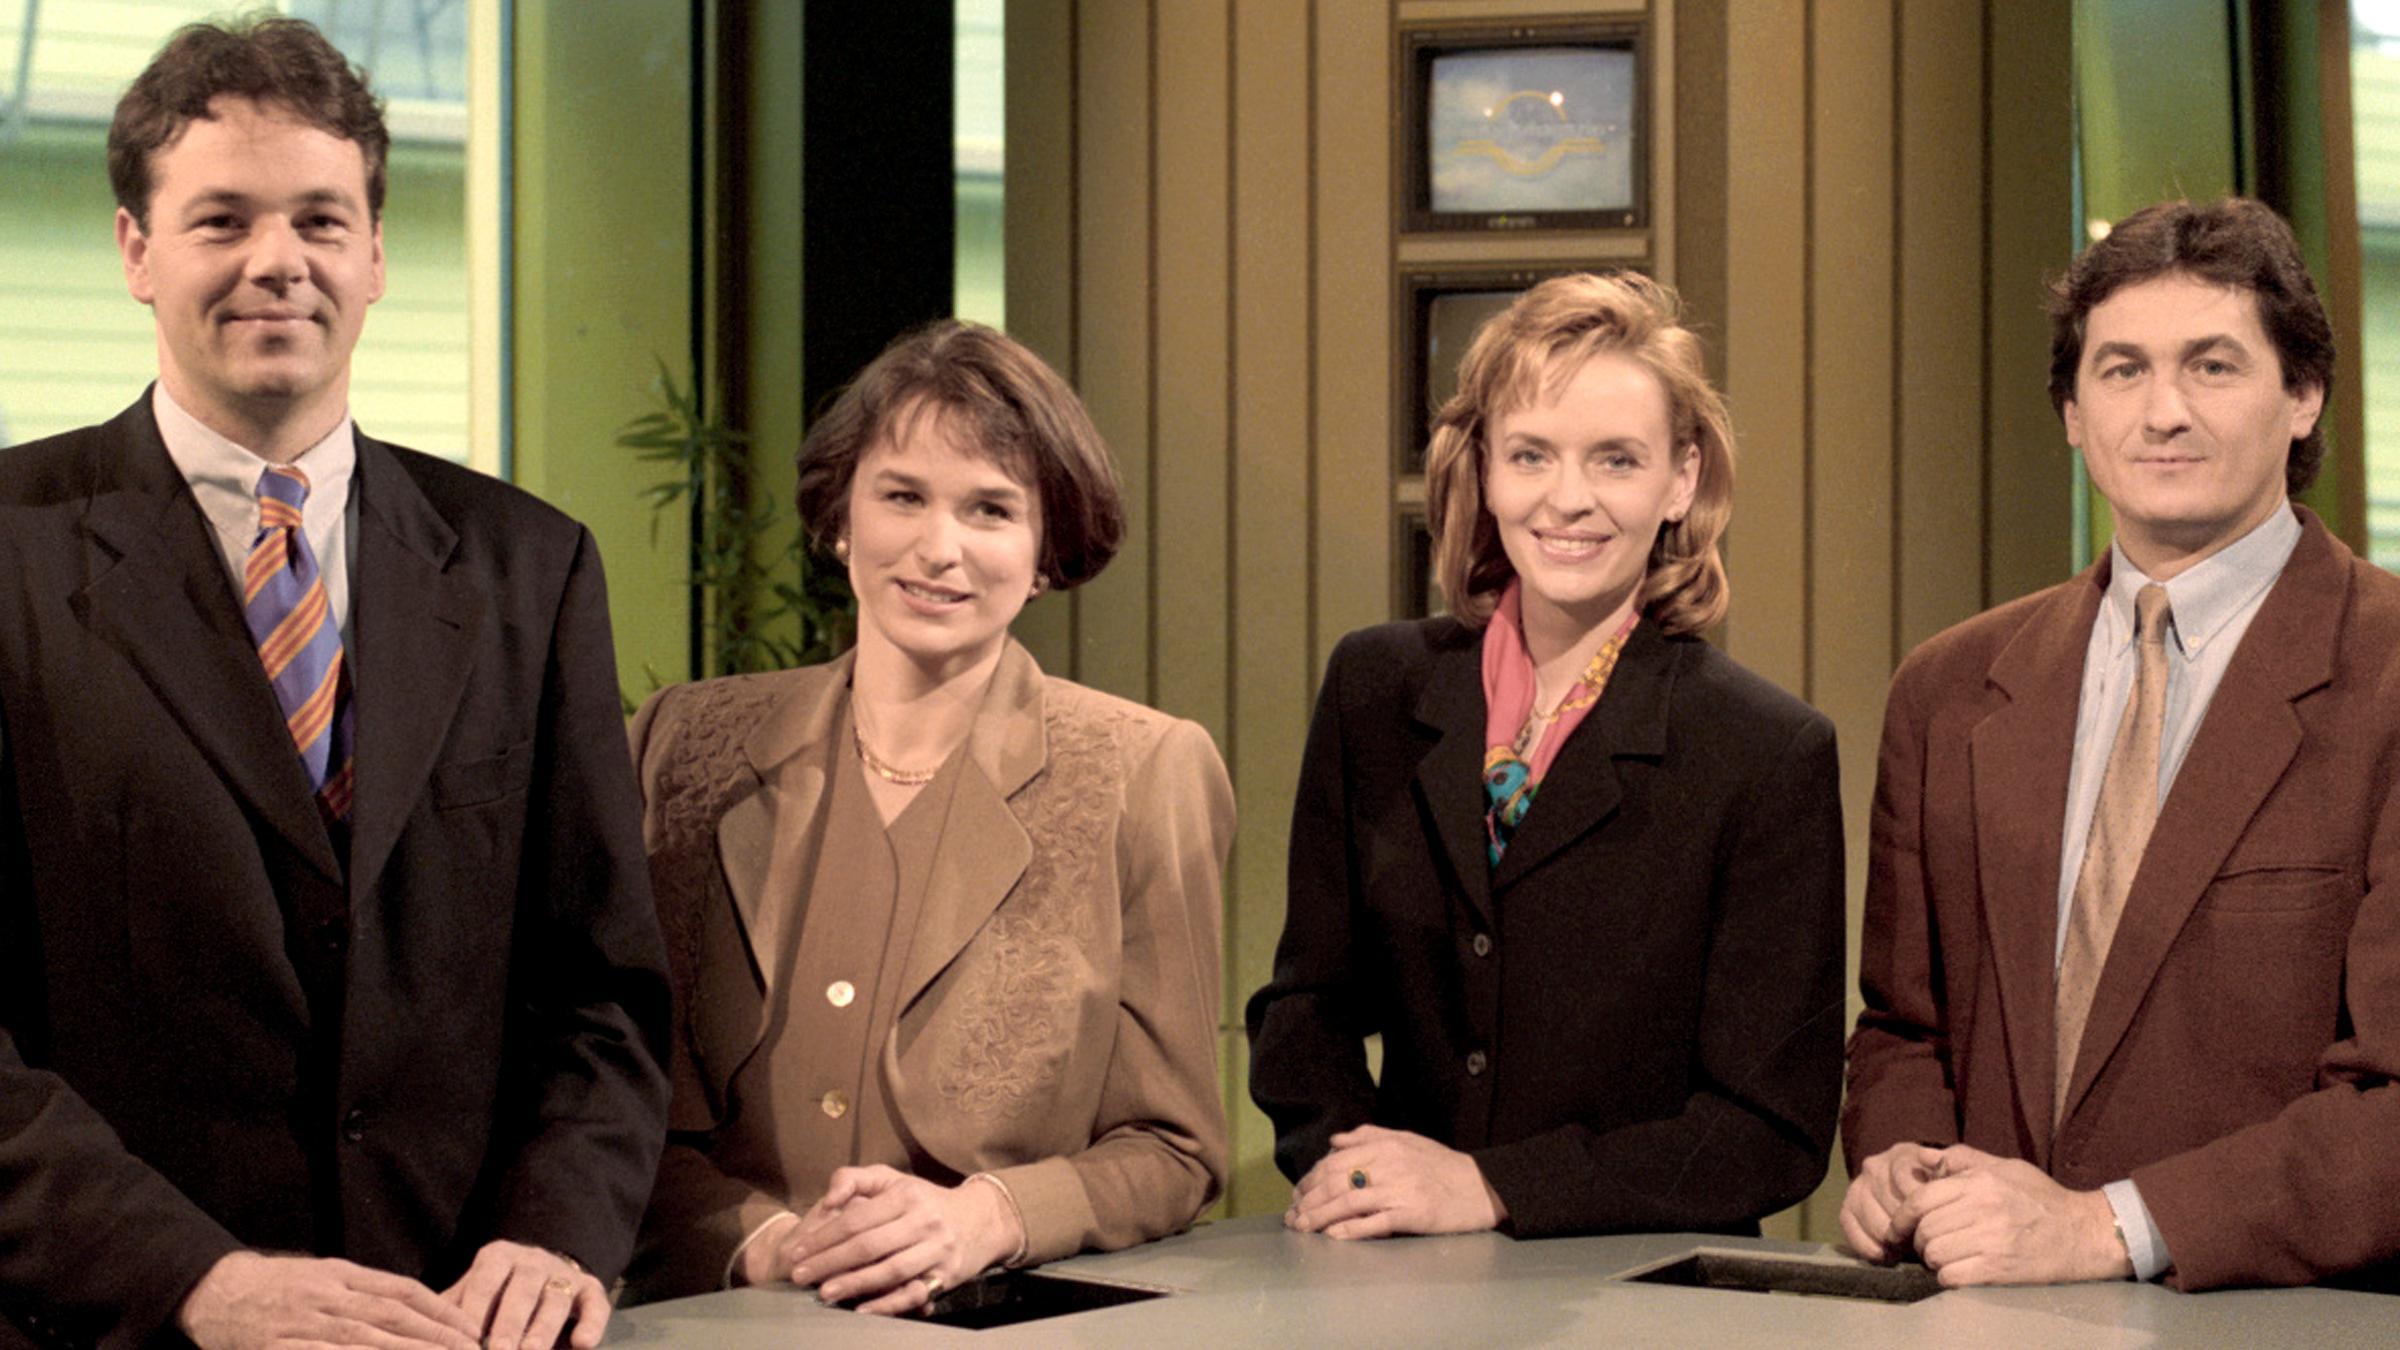 Axel Becher, Susanne Conrad, and Ulrike Grunewald in ZDF-Mittagsmagazin (1989)